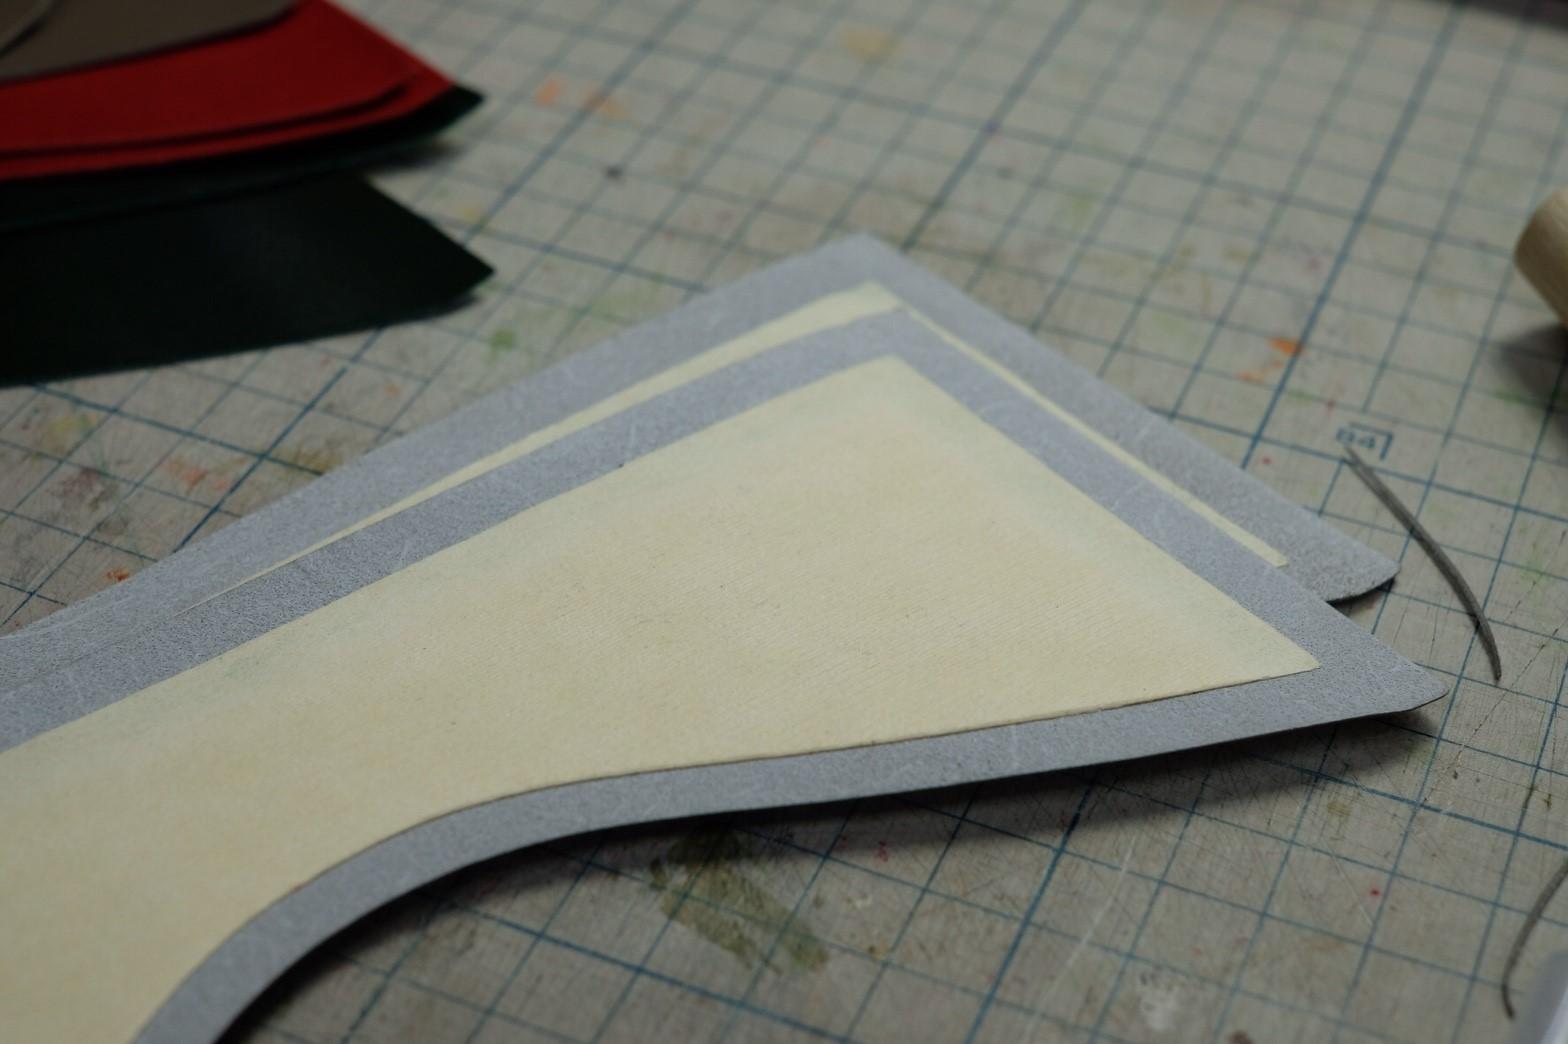 封筒型長財布の製作風景・前面部分の糊付け